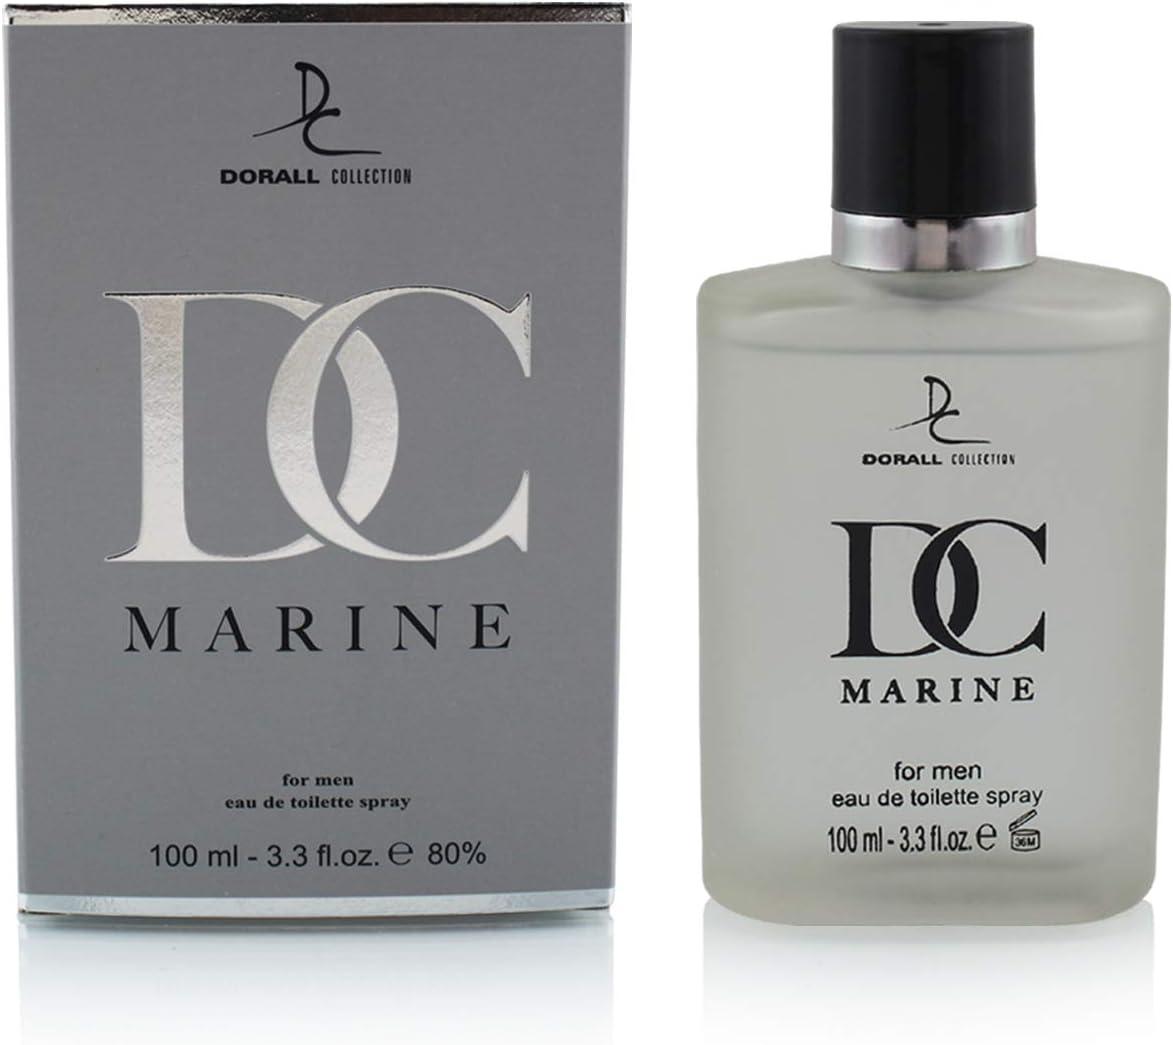 dc marine perfume price in india